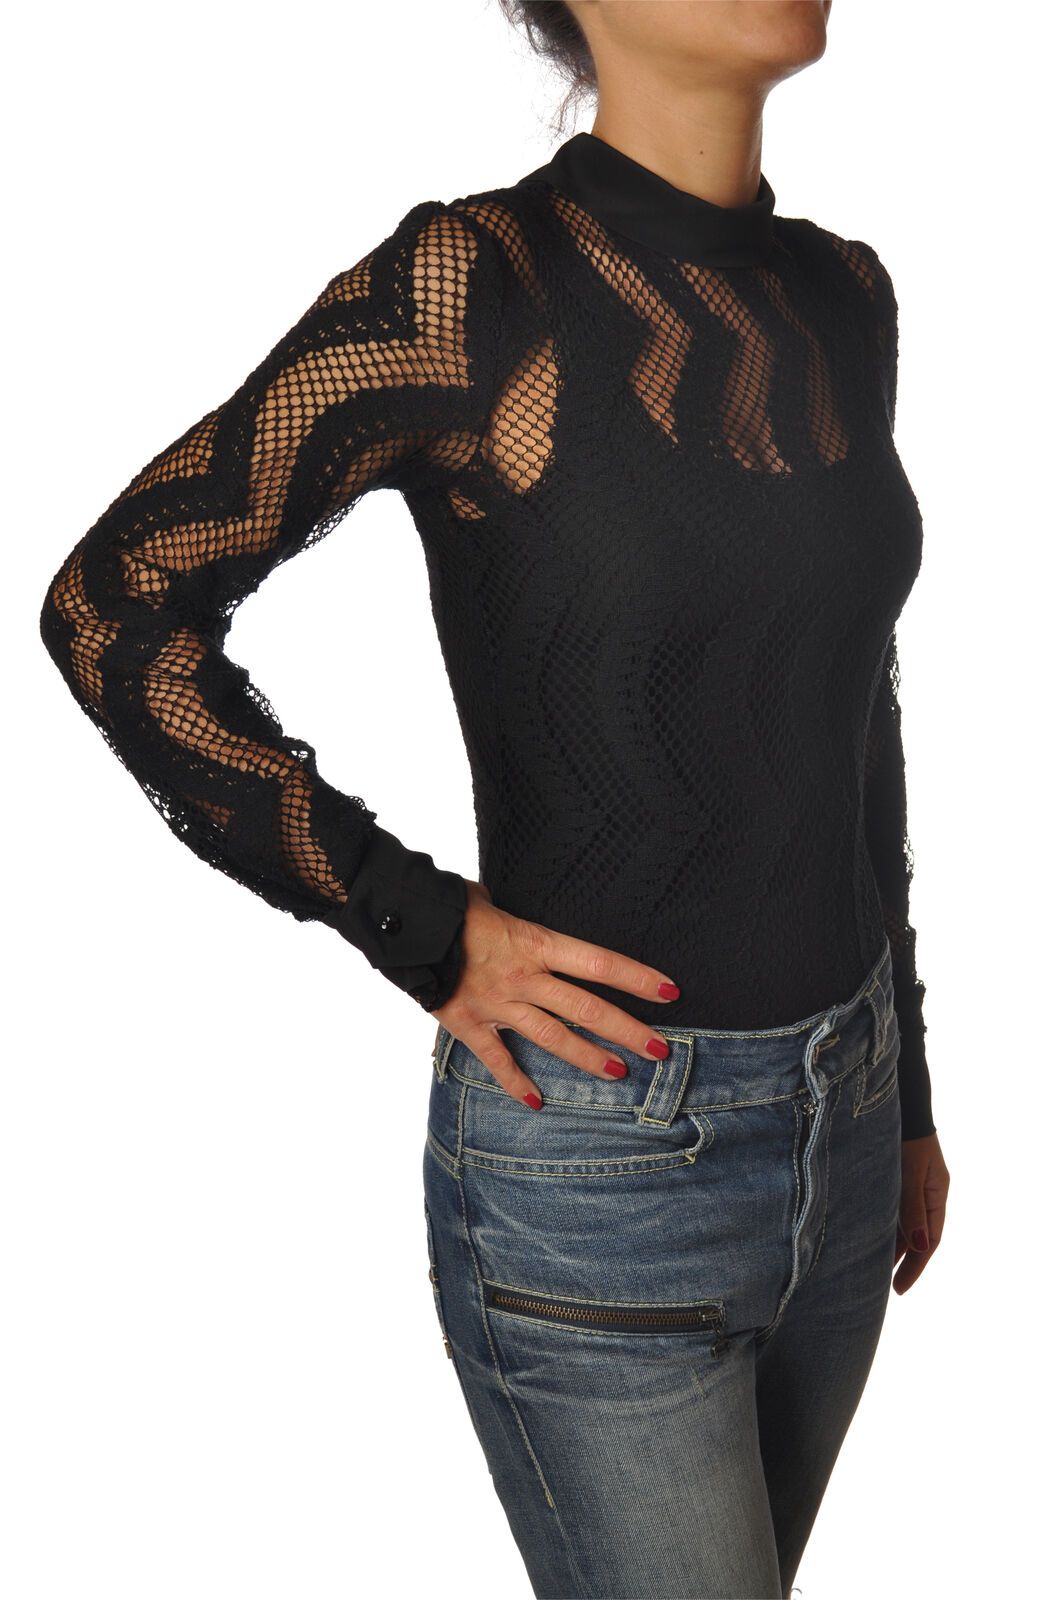 Rame - Shirts-Shirts - Woman - schwarz - 5730809E190653